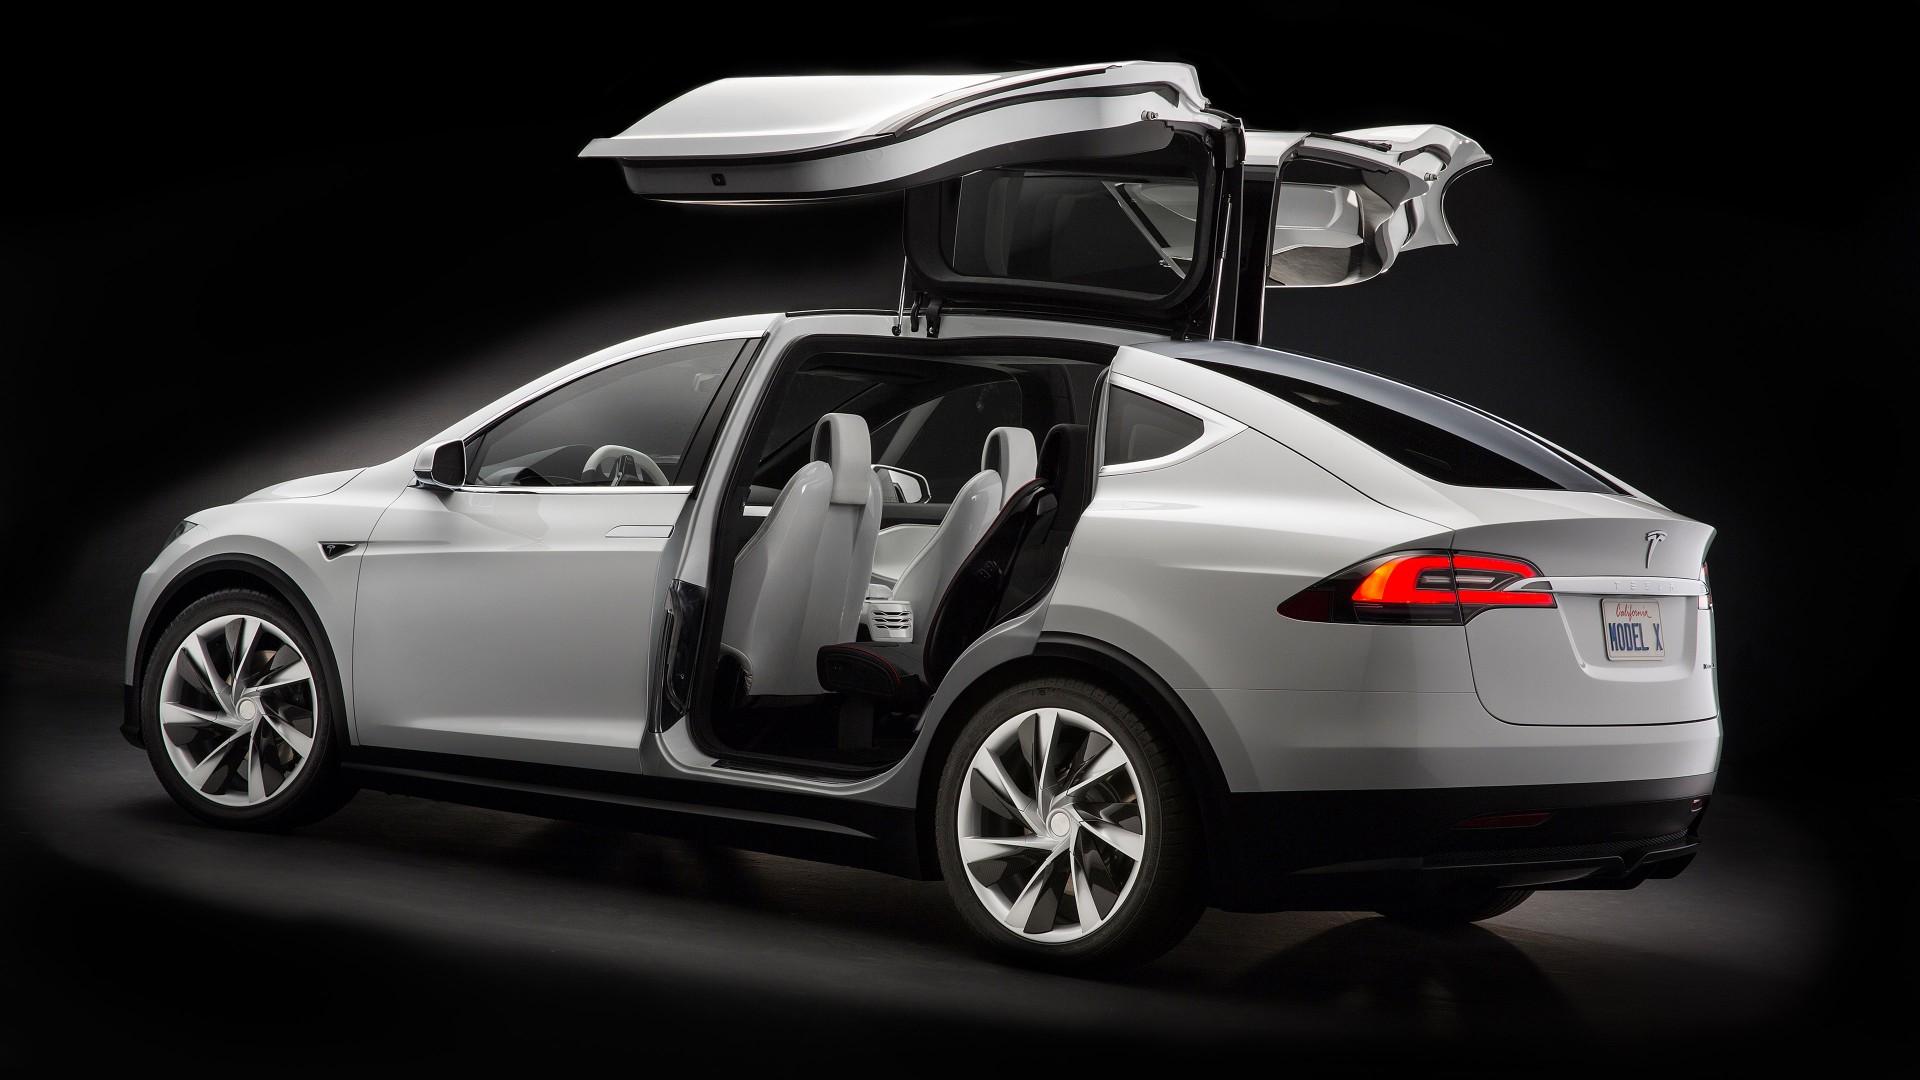 Wallpaper Tesla Model X, White, Electric Cars, Suv, 2016